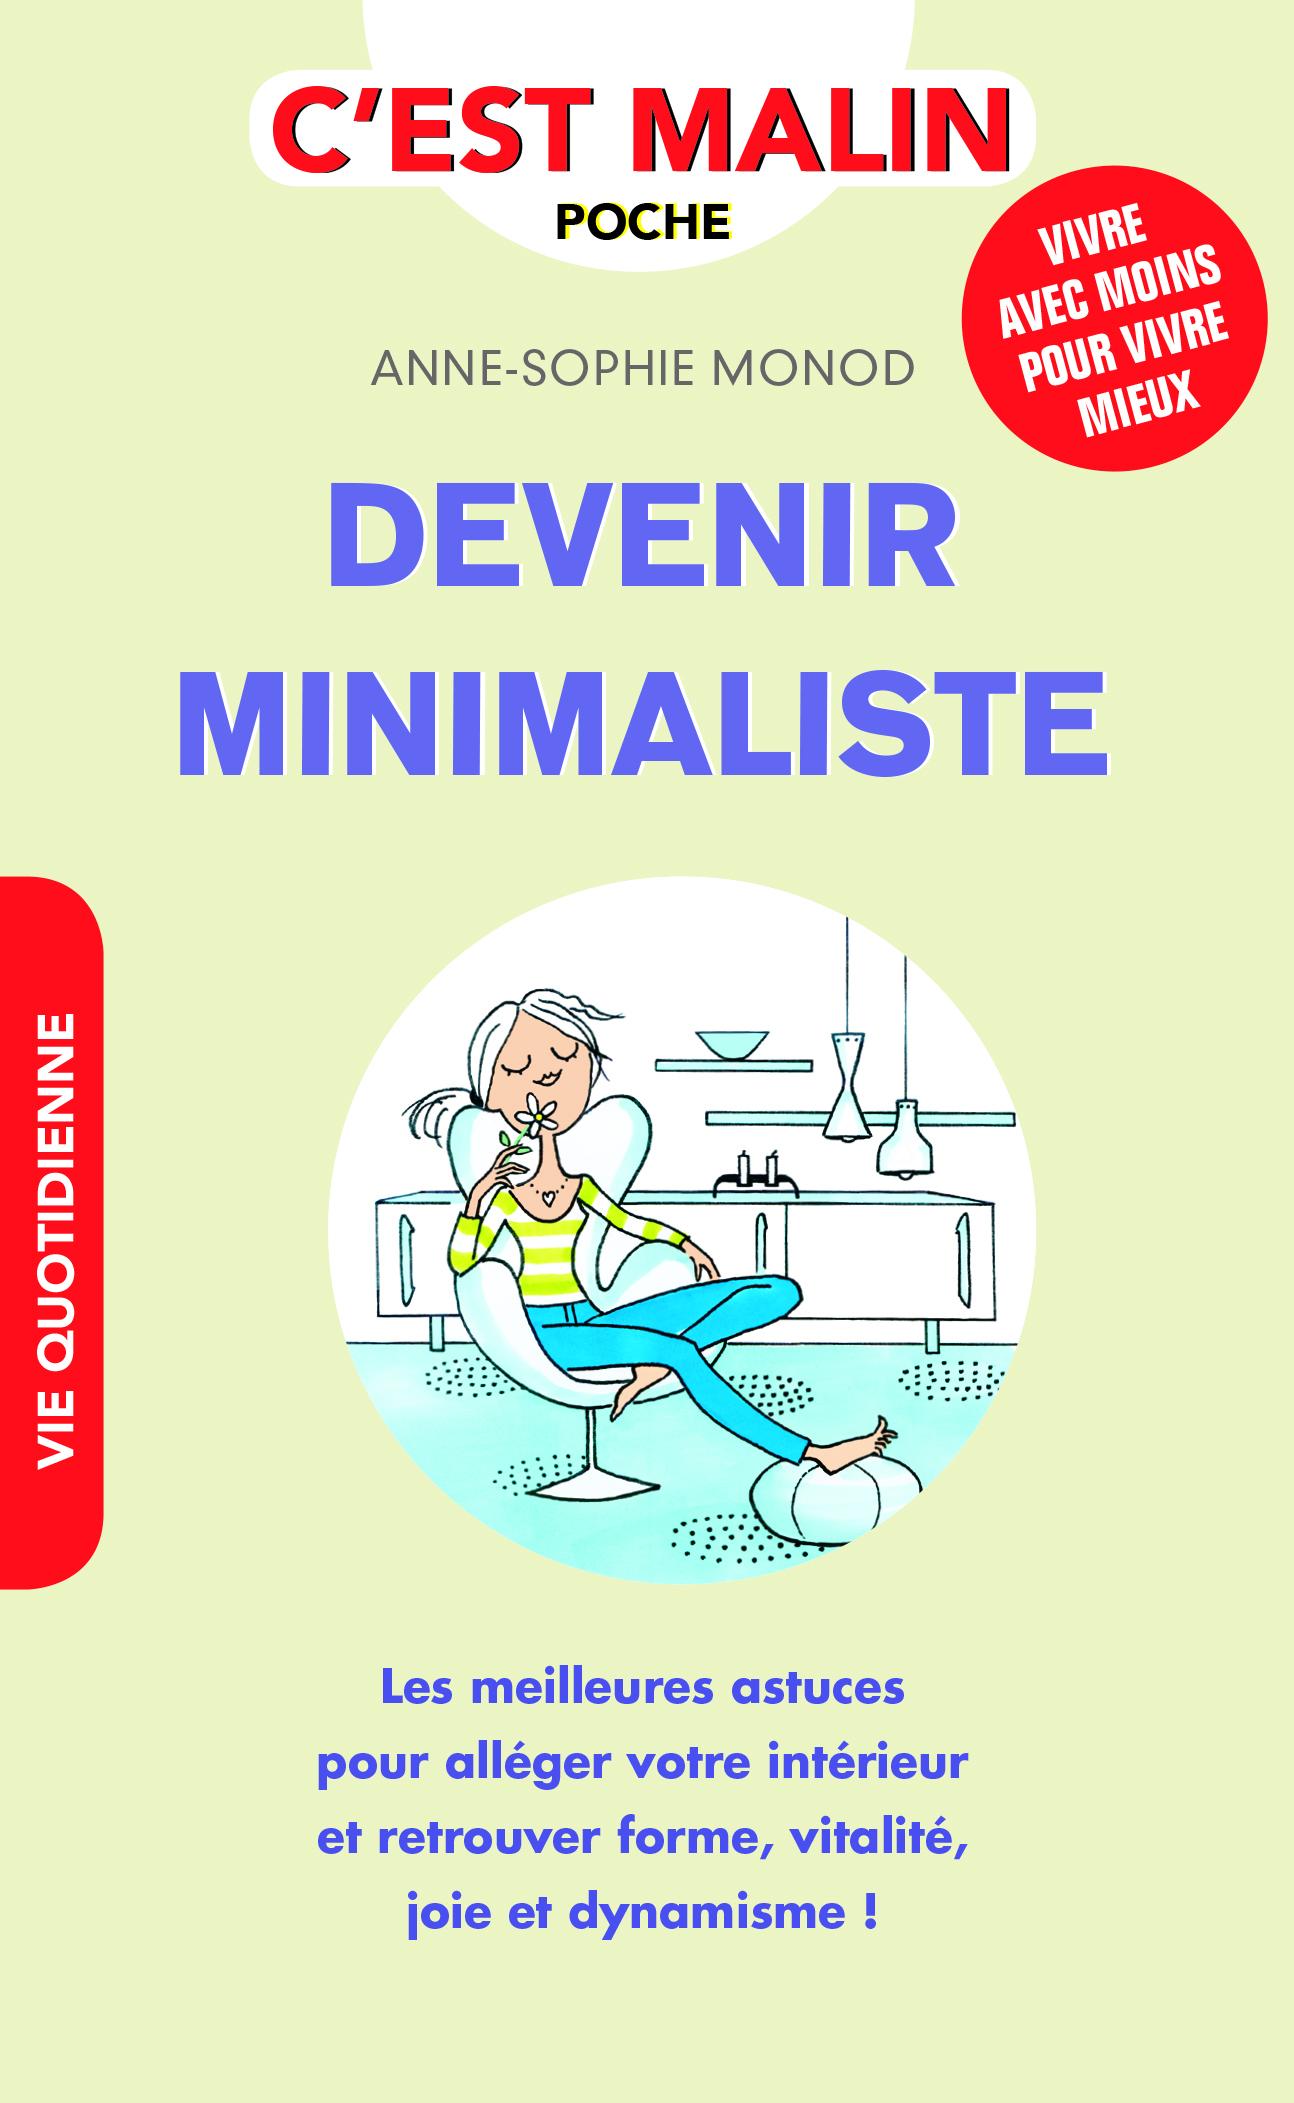 DEVENIR MINIMALISTE C'EST MALIN